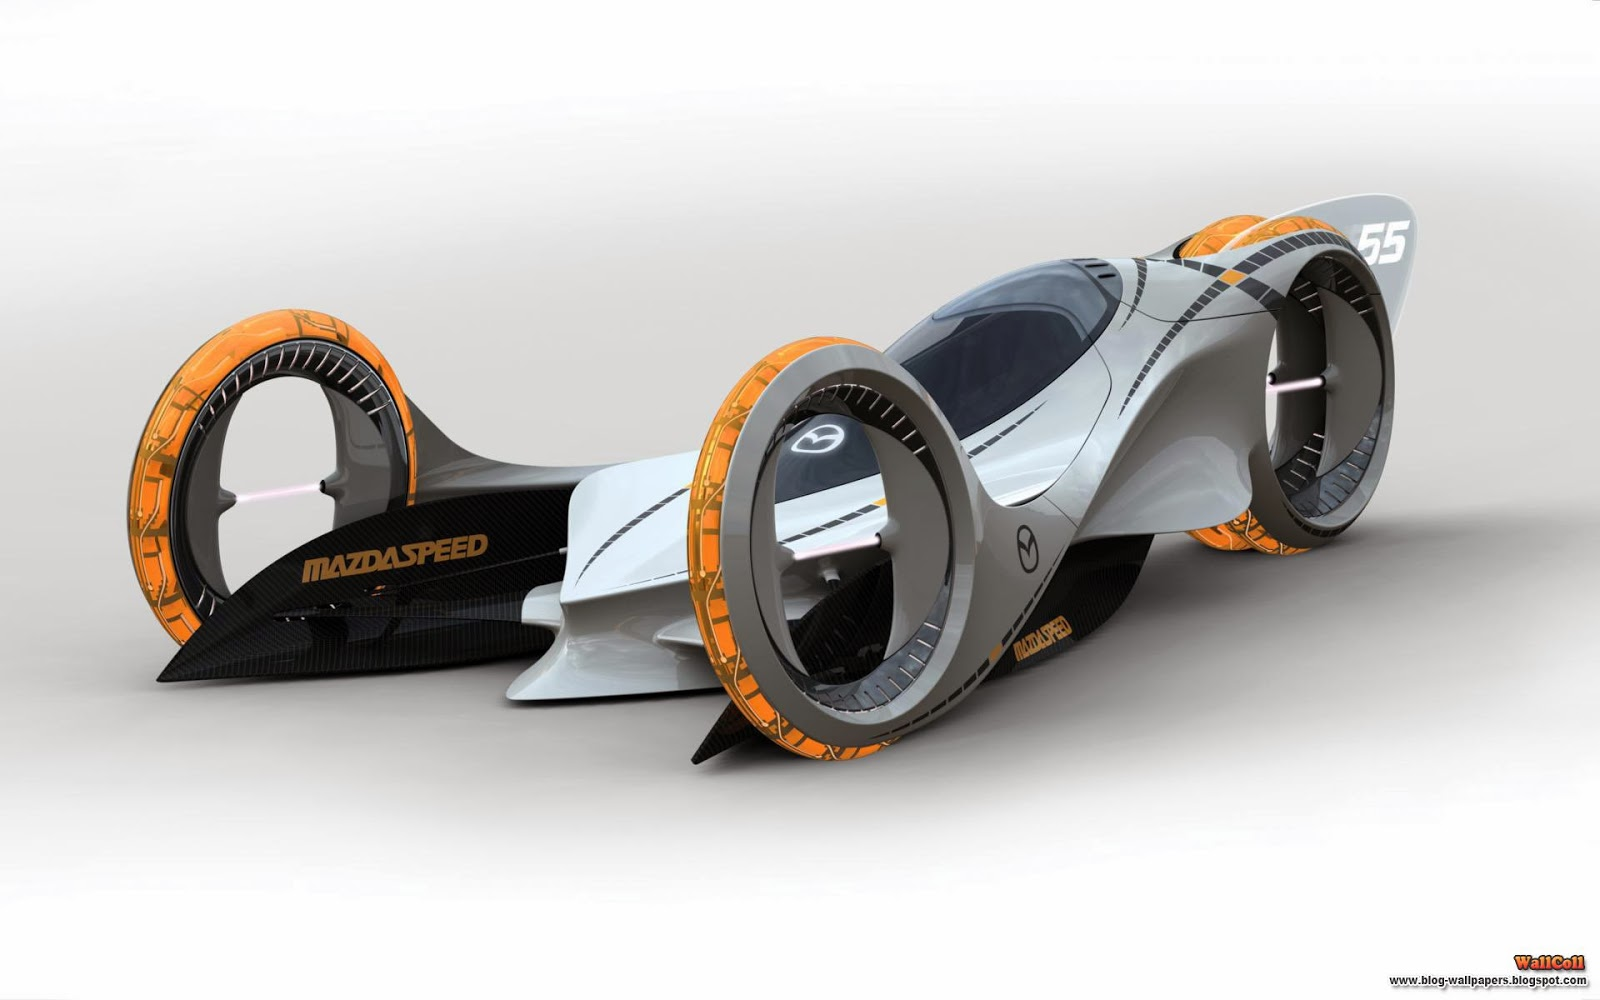 informative blog: future cars and bikes